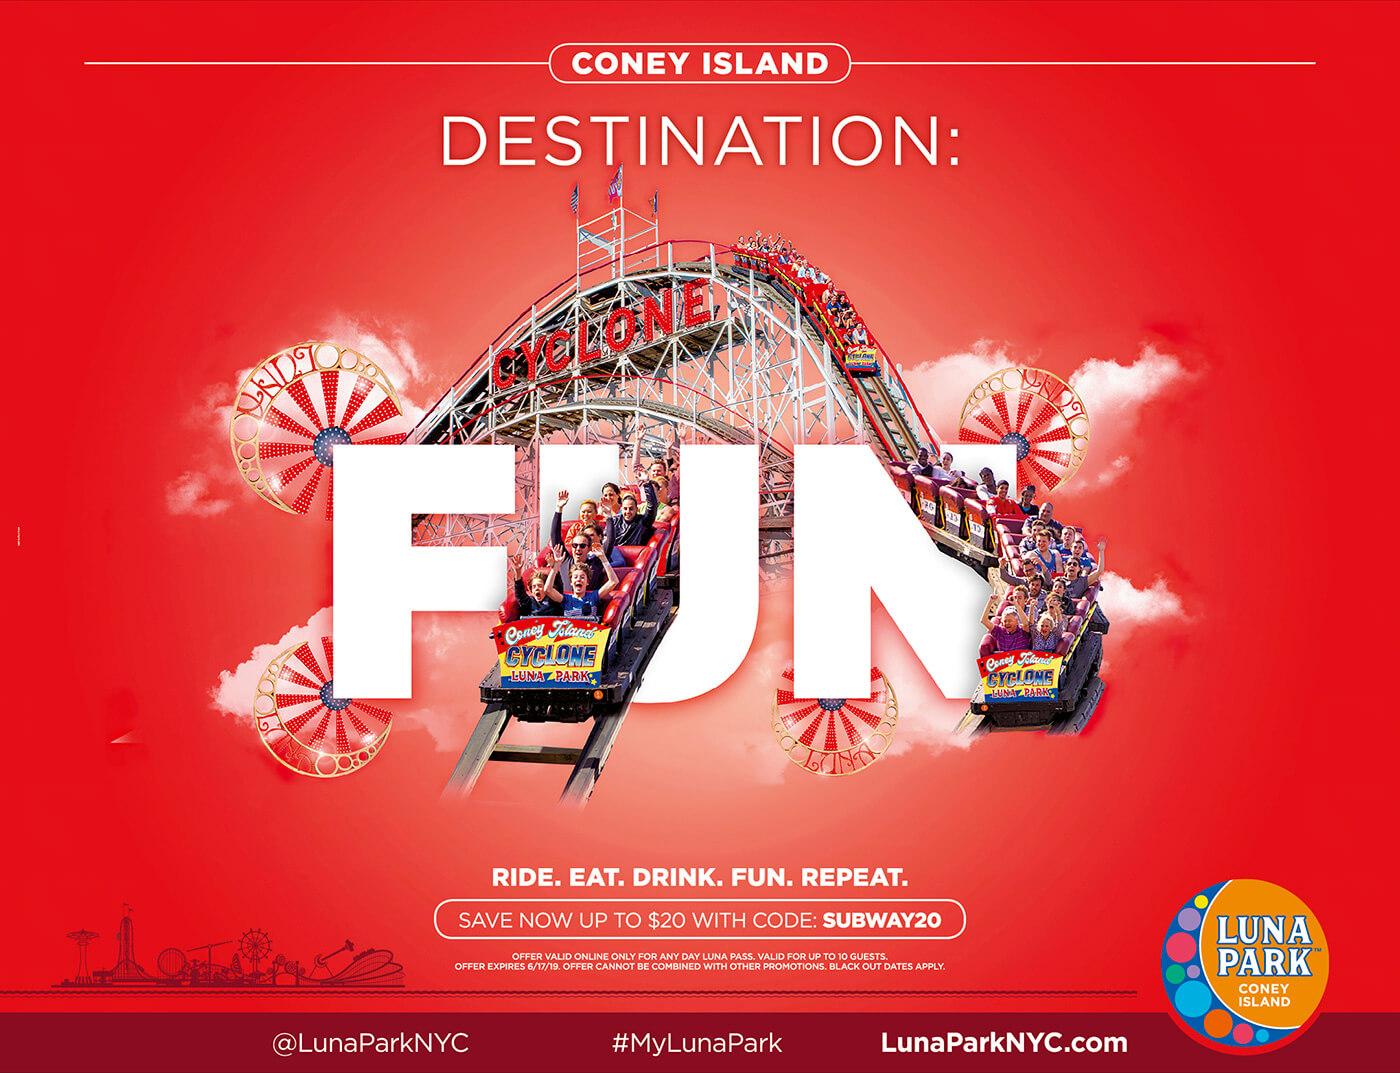 Adv Luna Park - Coney Island Destination: Fun